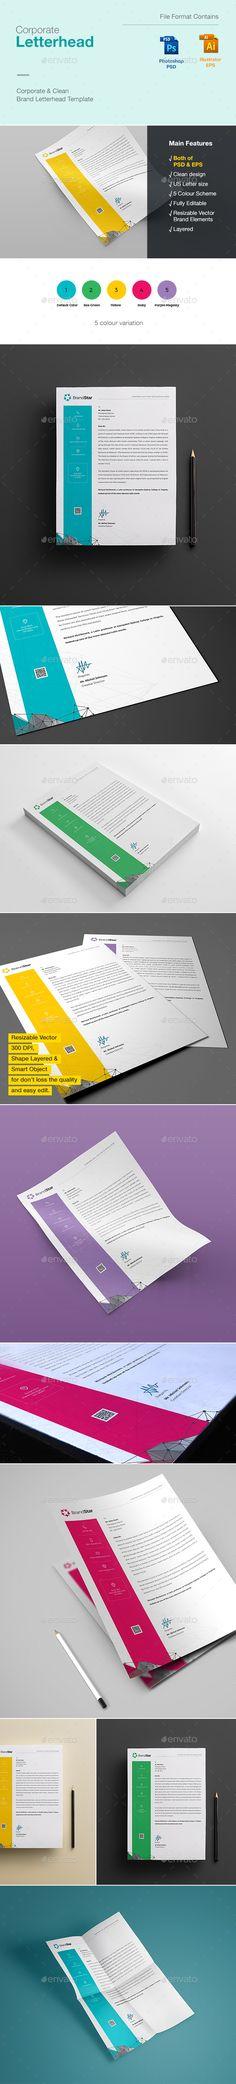 99 best letterhead images on pinterest design patterns design letterhead design template psd vector eps thecheapjerseys Images